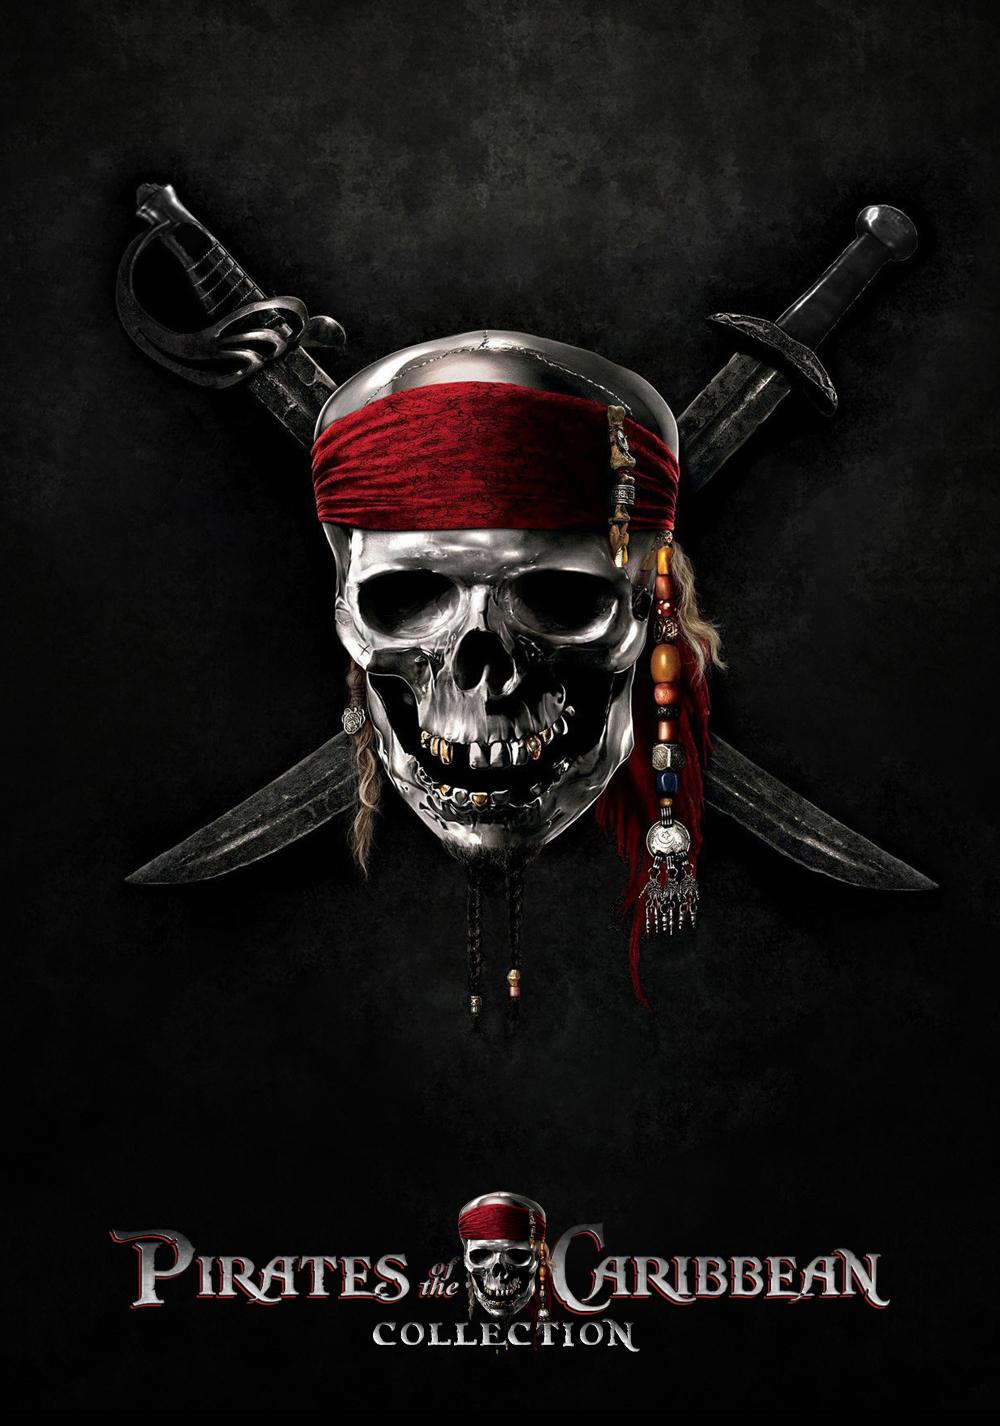 Pirates carribean movie